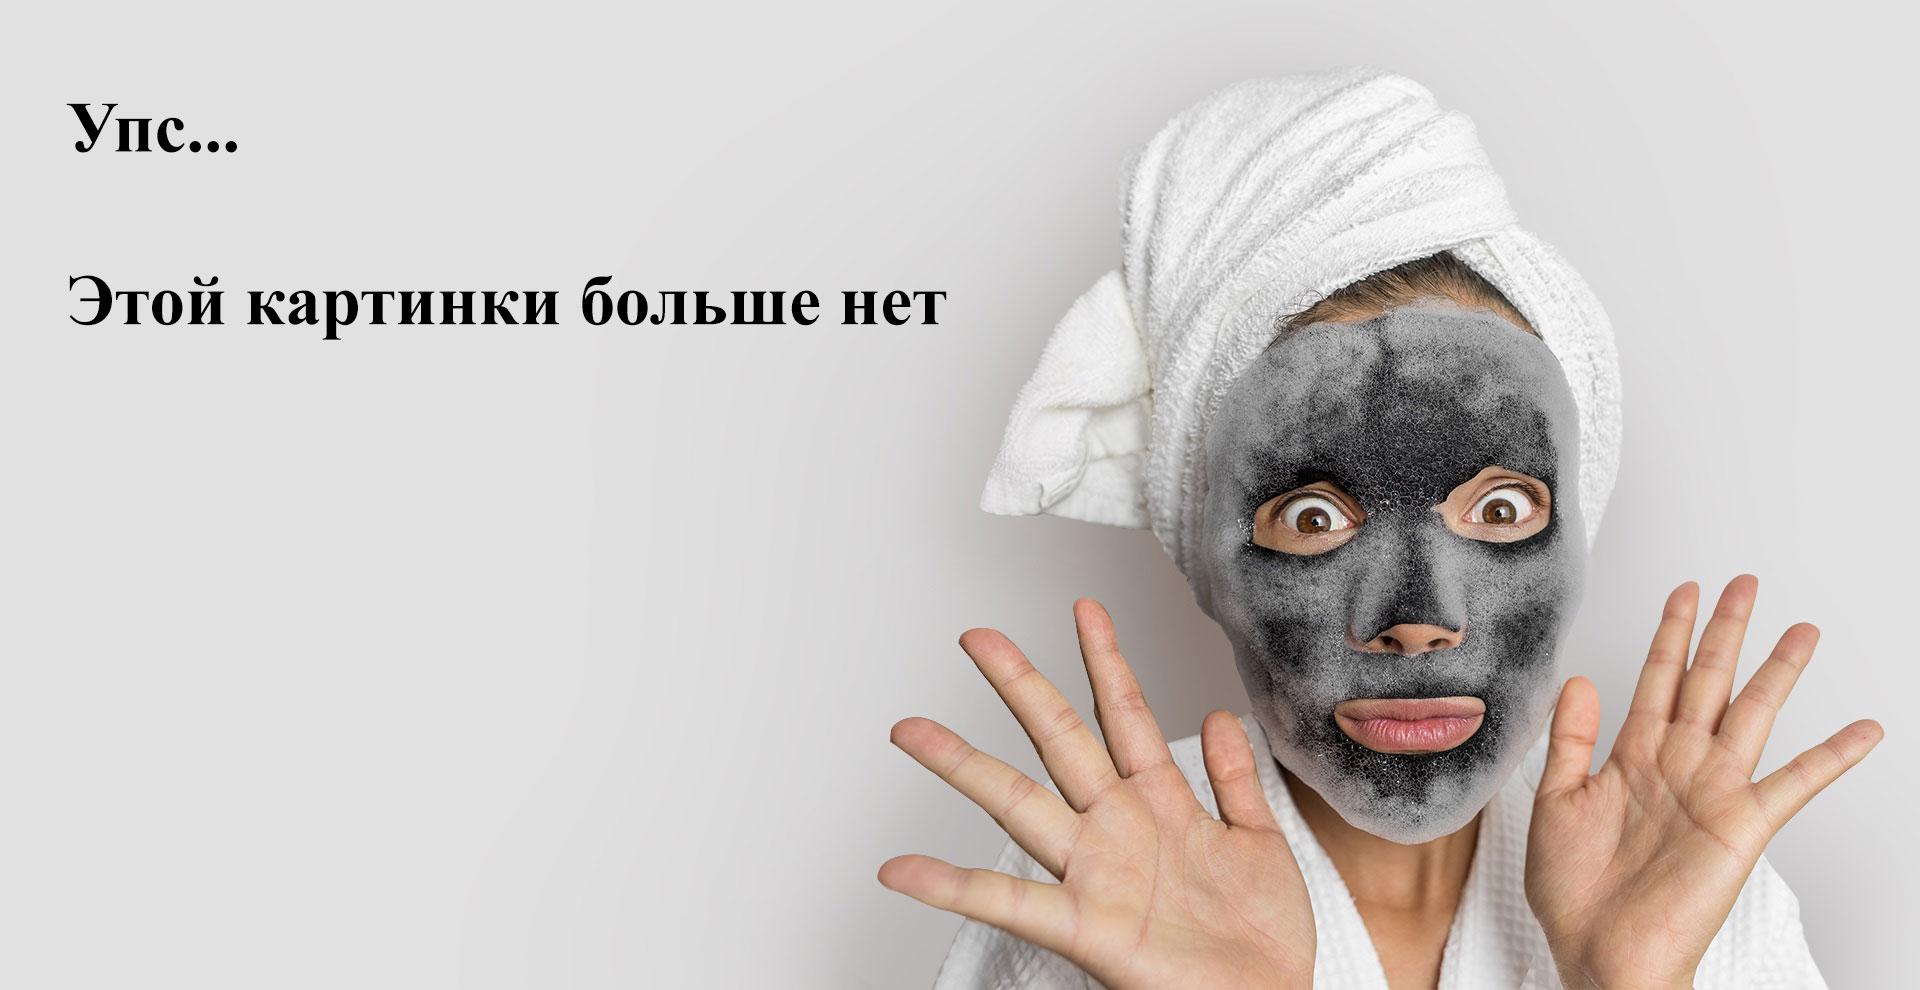 JASON, Жидкое мыло для рук и тела Soothing Aloe Vera, 473 мл